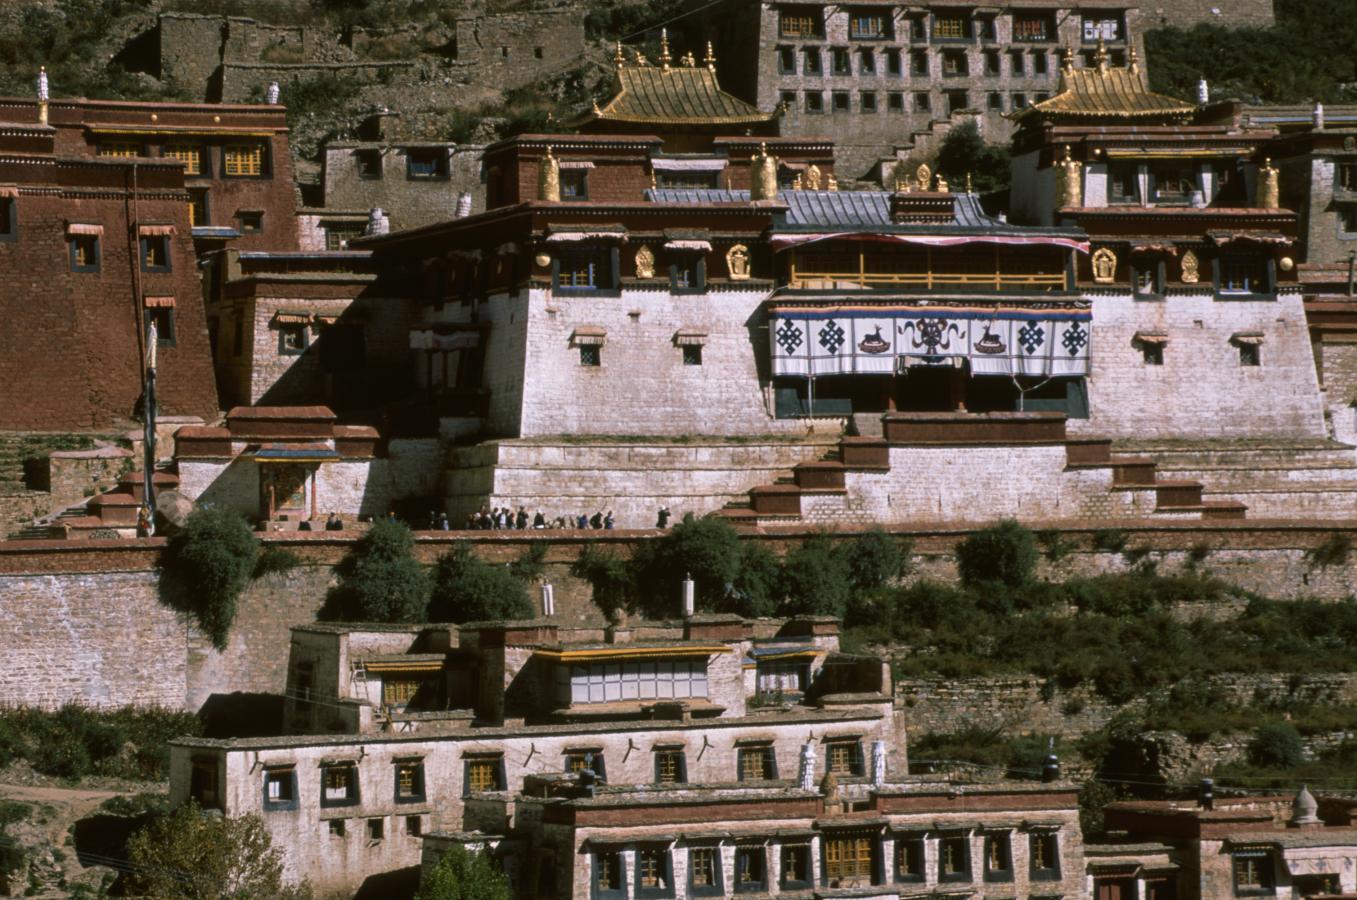 ganden-monastery-tagtse-tibet-2000